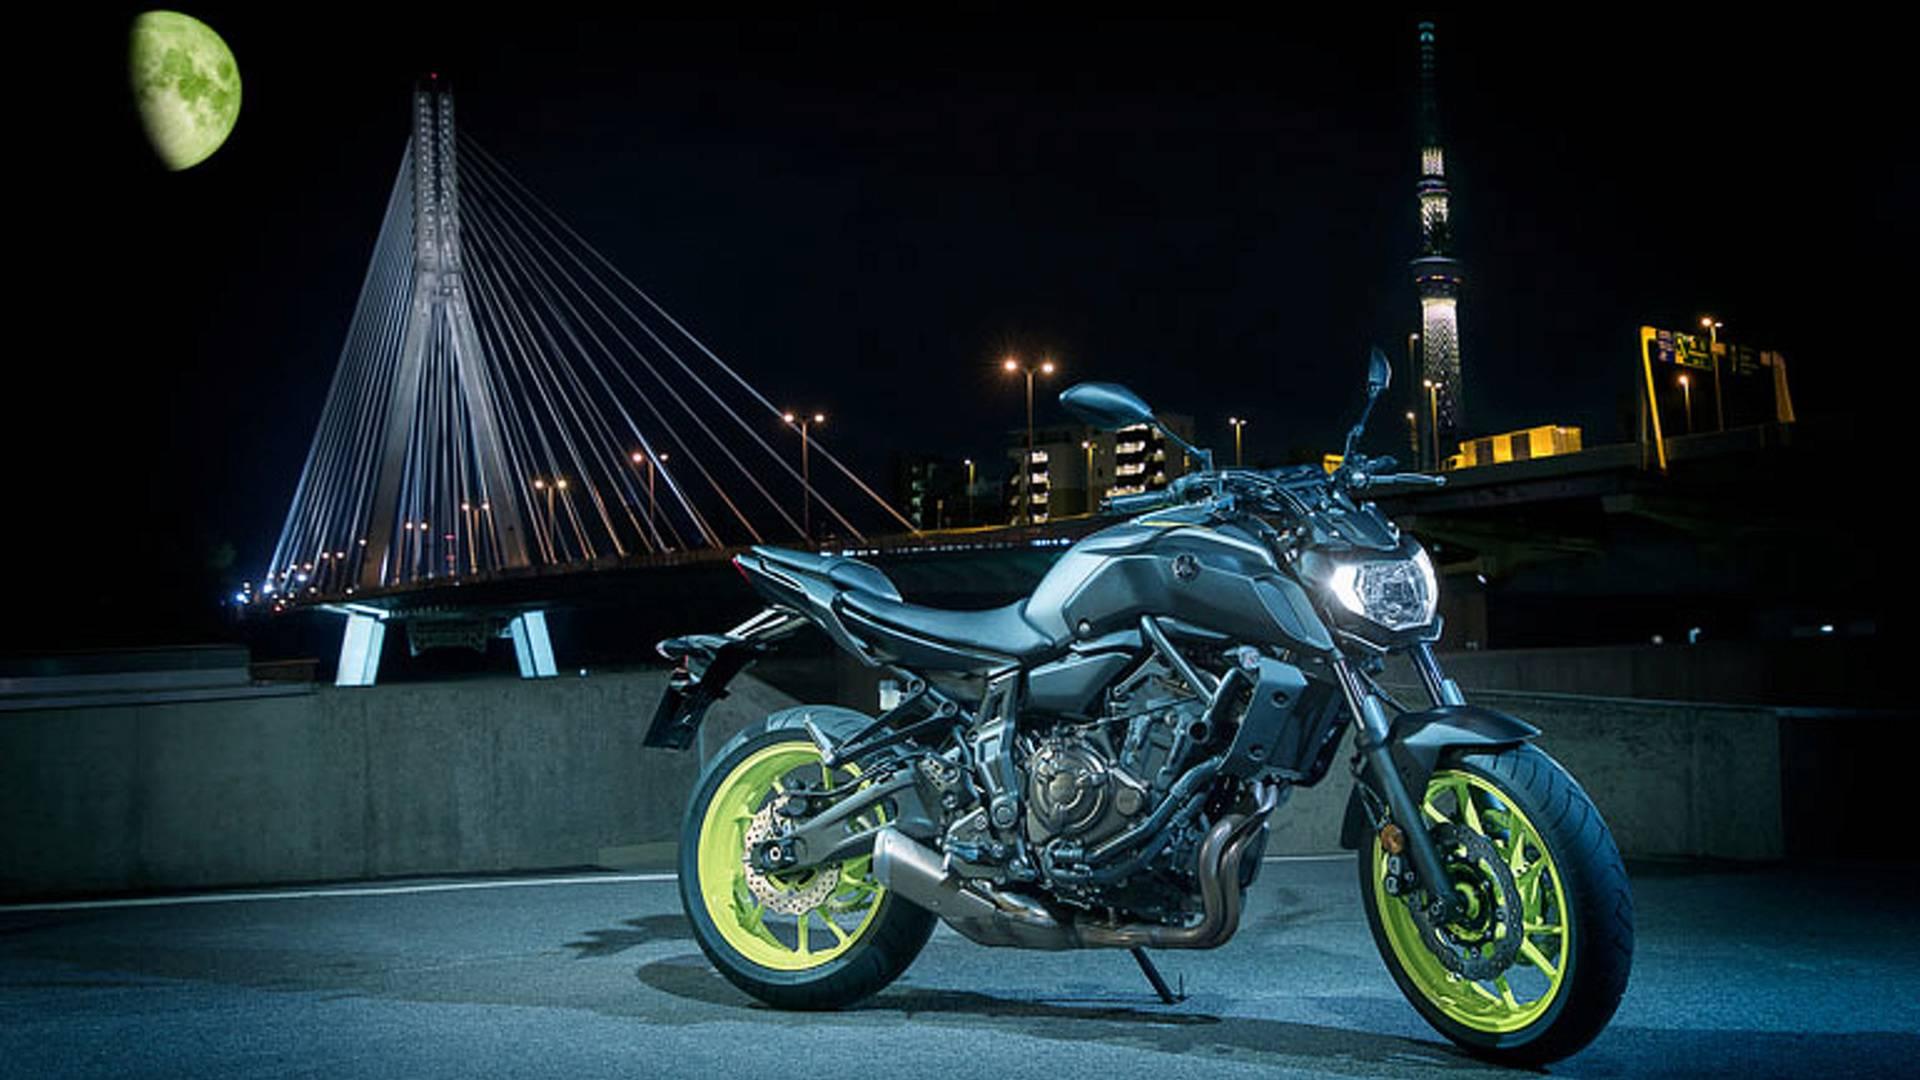 First Ride: 2018 Yamaha MT-07